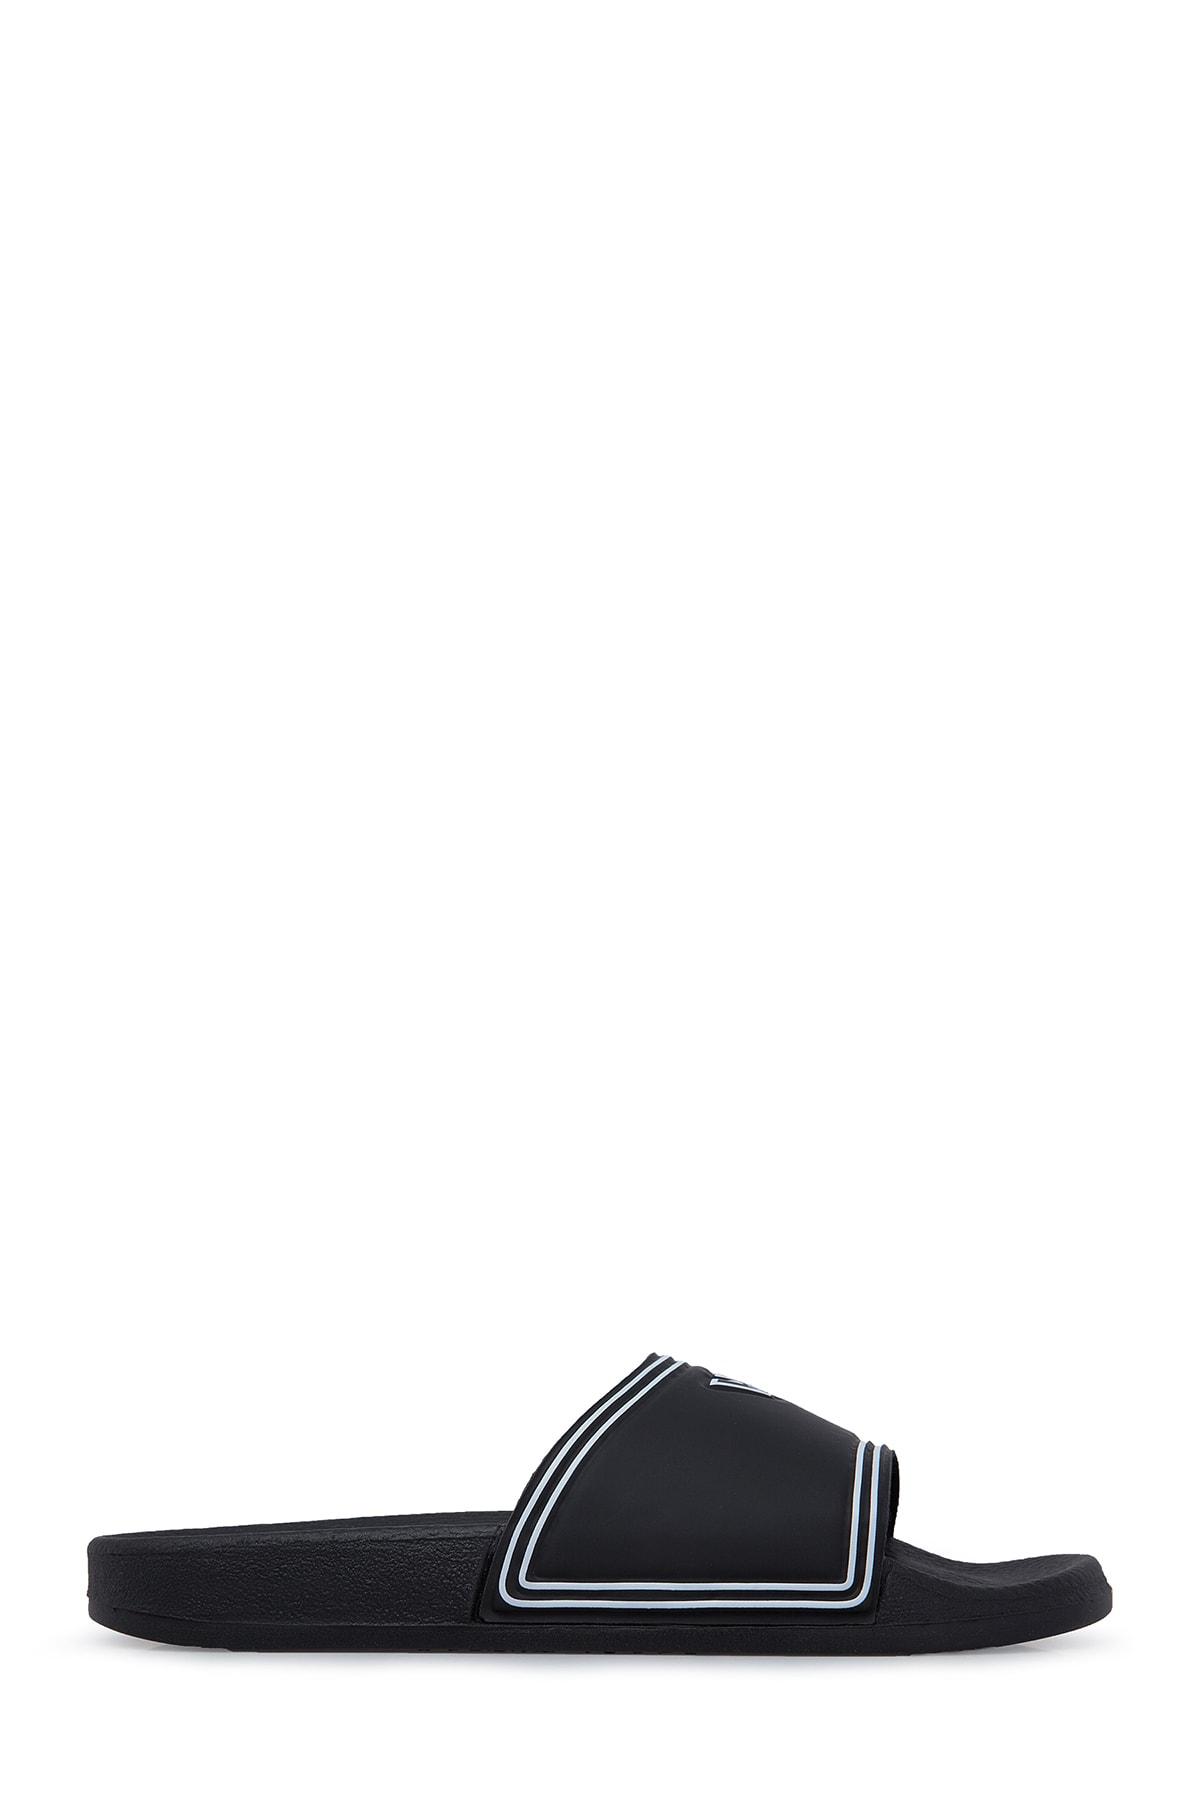 Emporio Armani Siyah Kadın Terlik S X3P706 XD184 00500 1